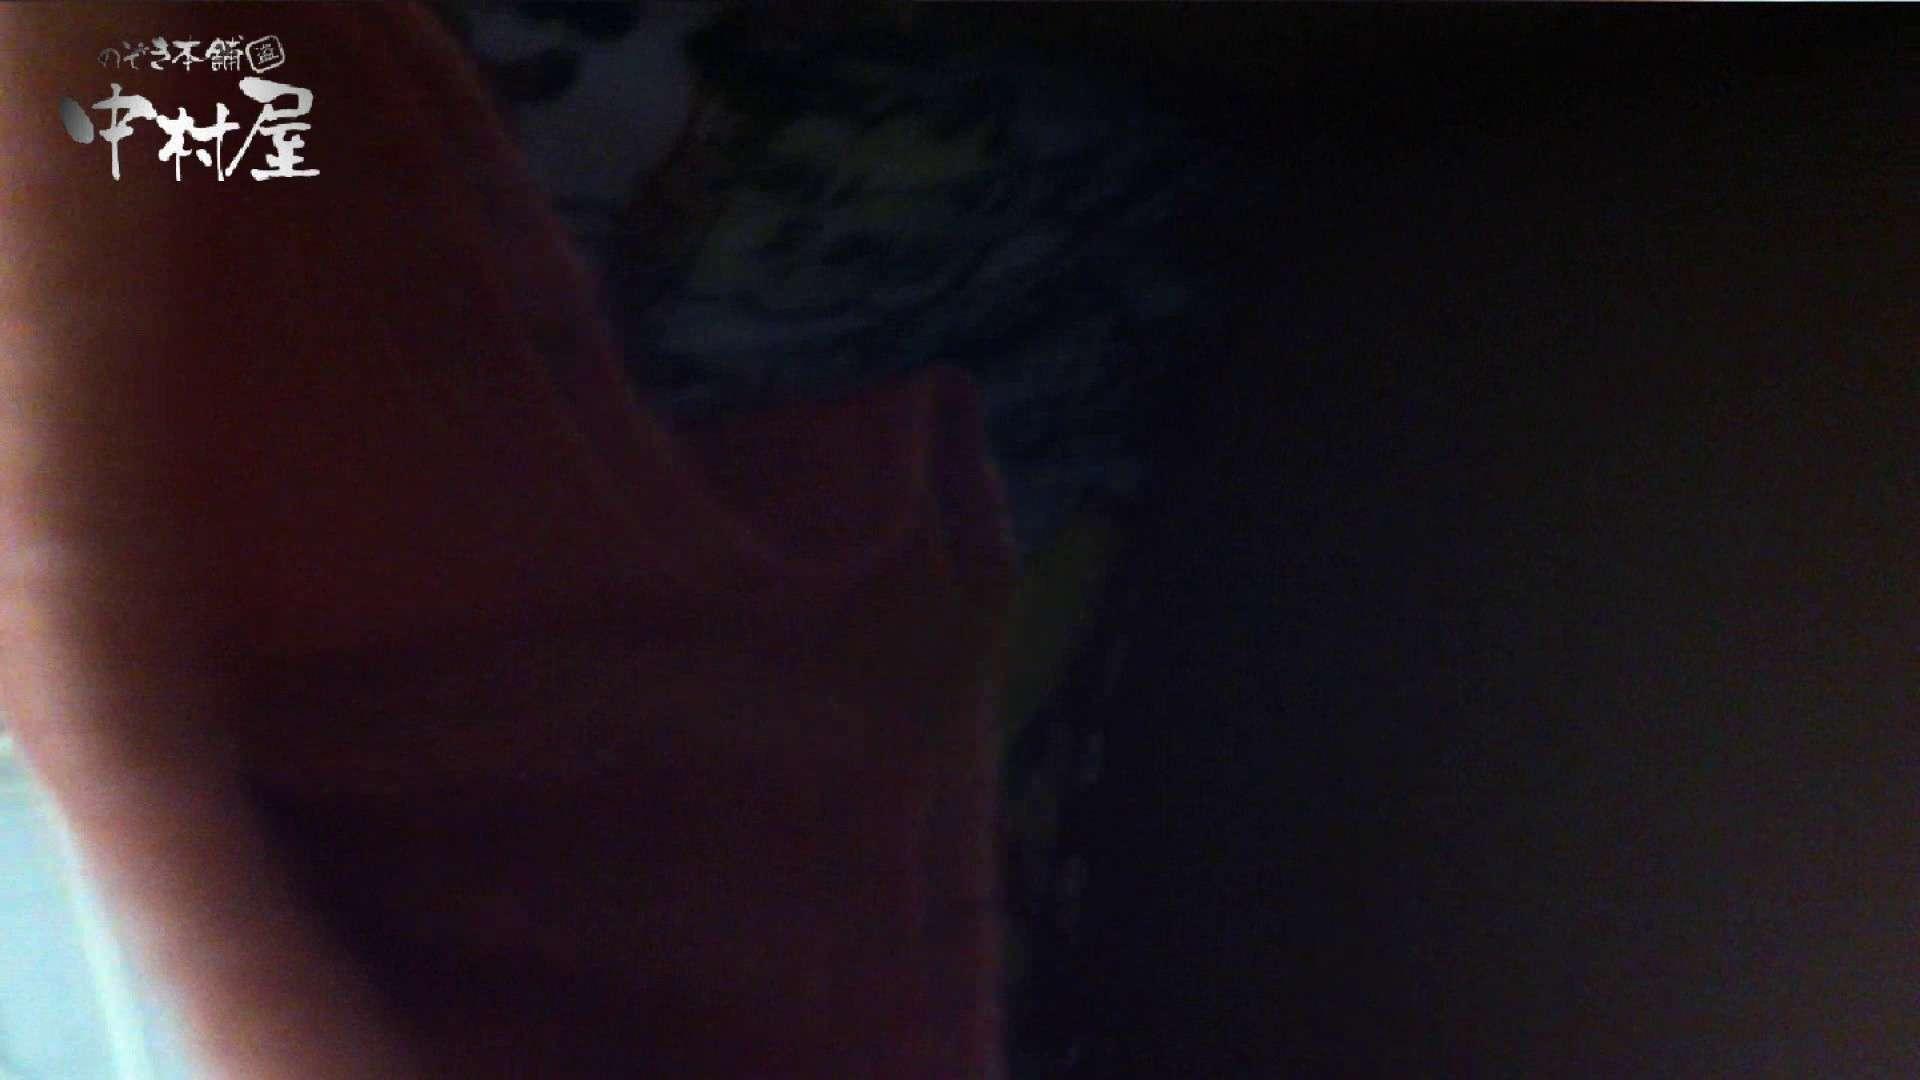 vol.45 可愛いカリスマ店員限定‼胸チラ&パンチラ 食い込みミッキーマウス! おまんこ のぞき動画画像 103画像 46